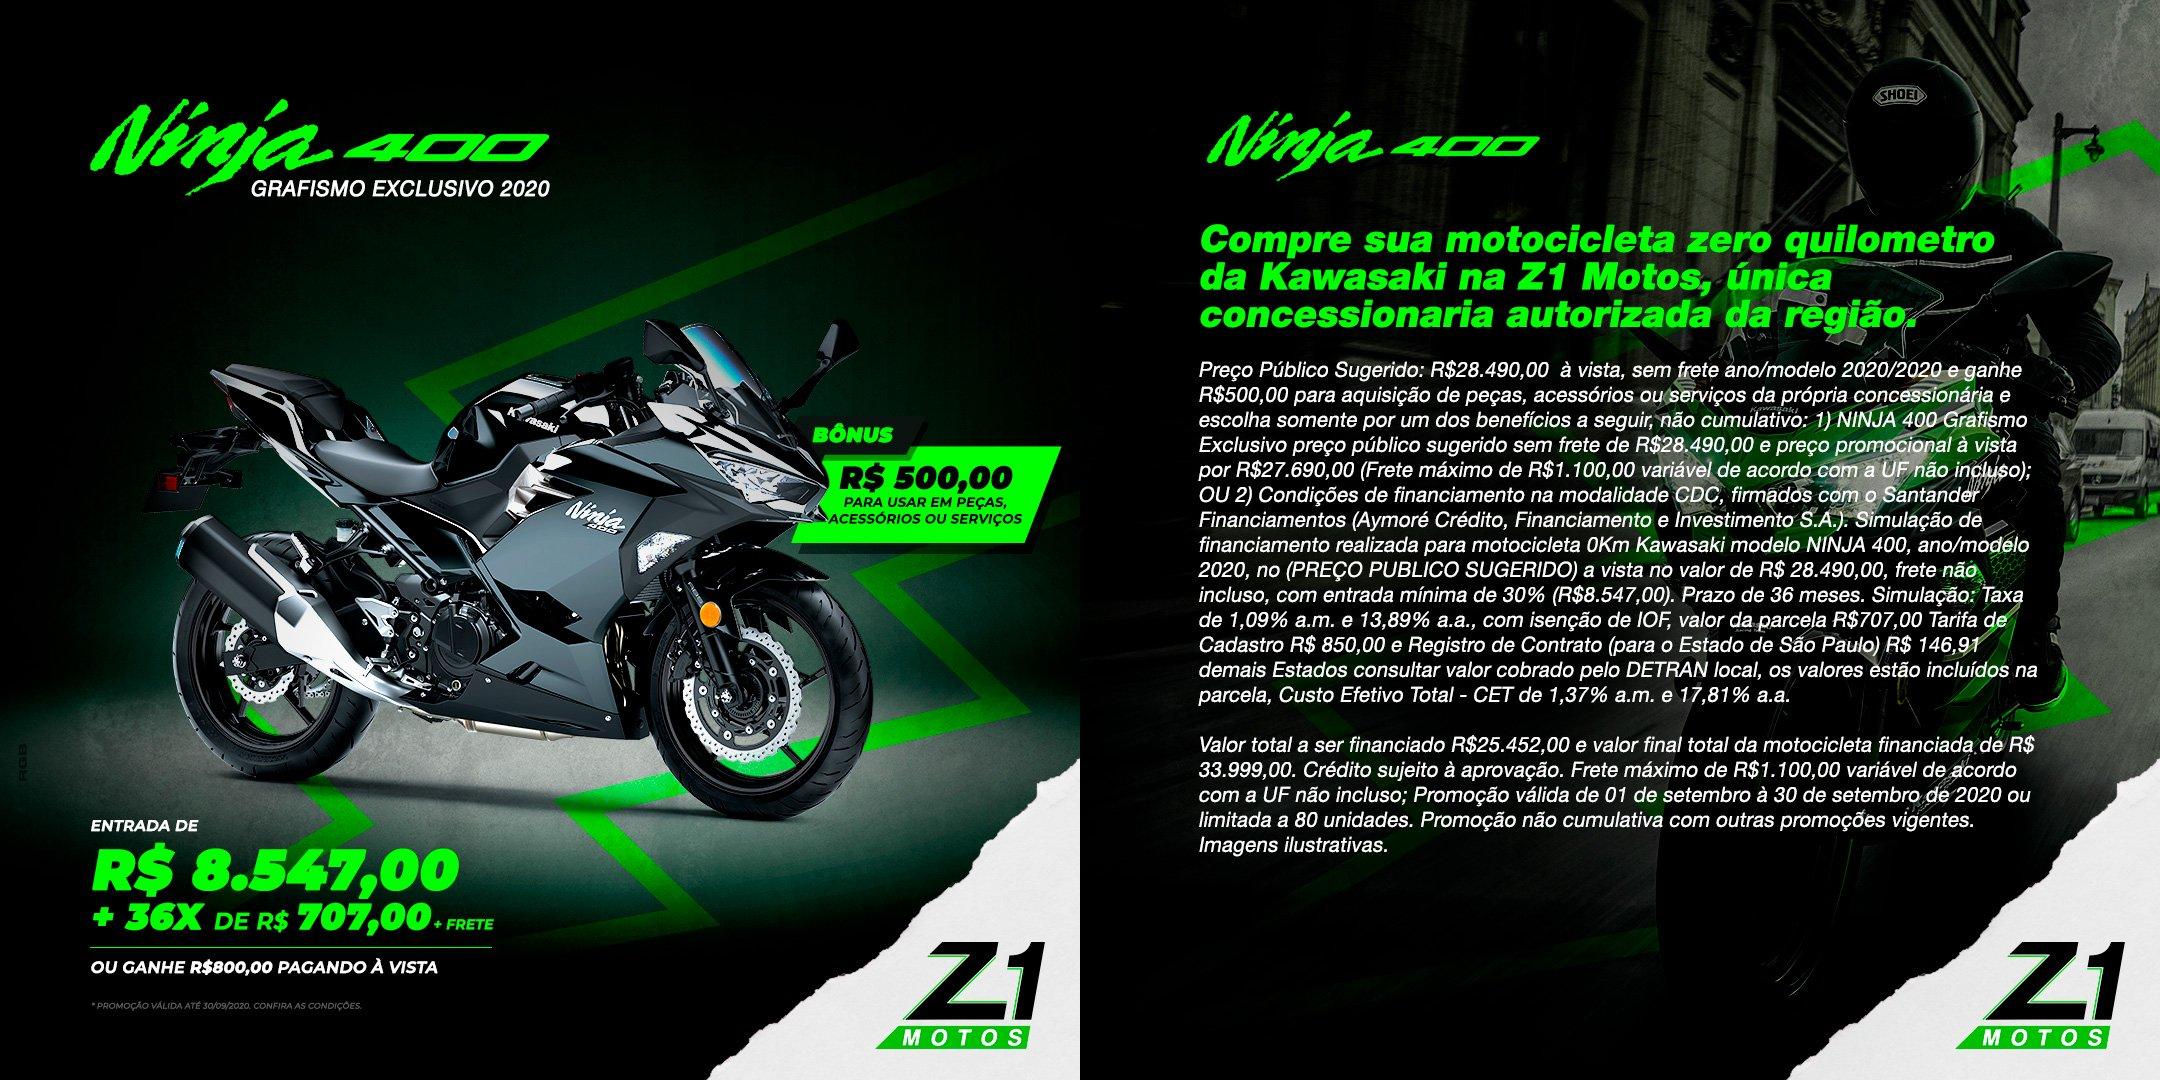 Ninja 400 - Grafismo Exclusivo 2020